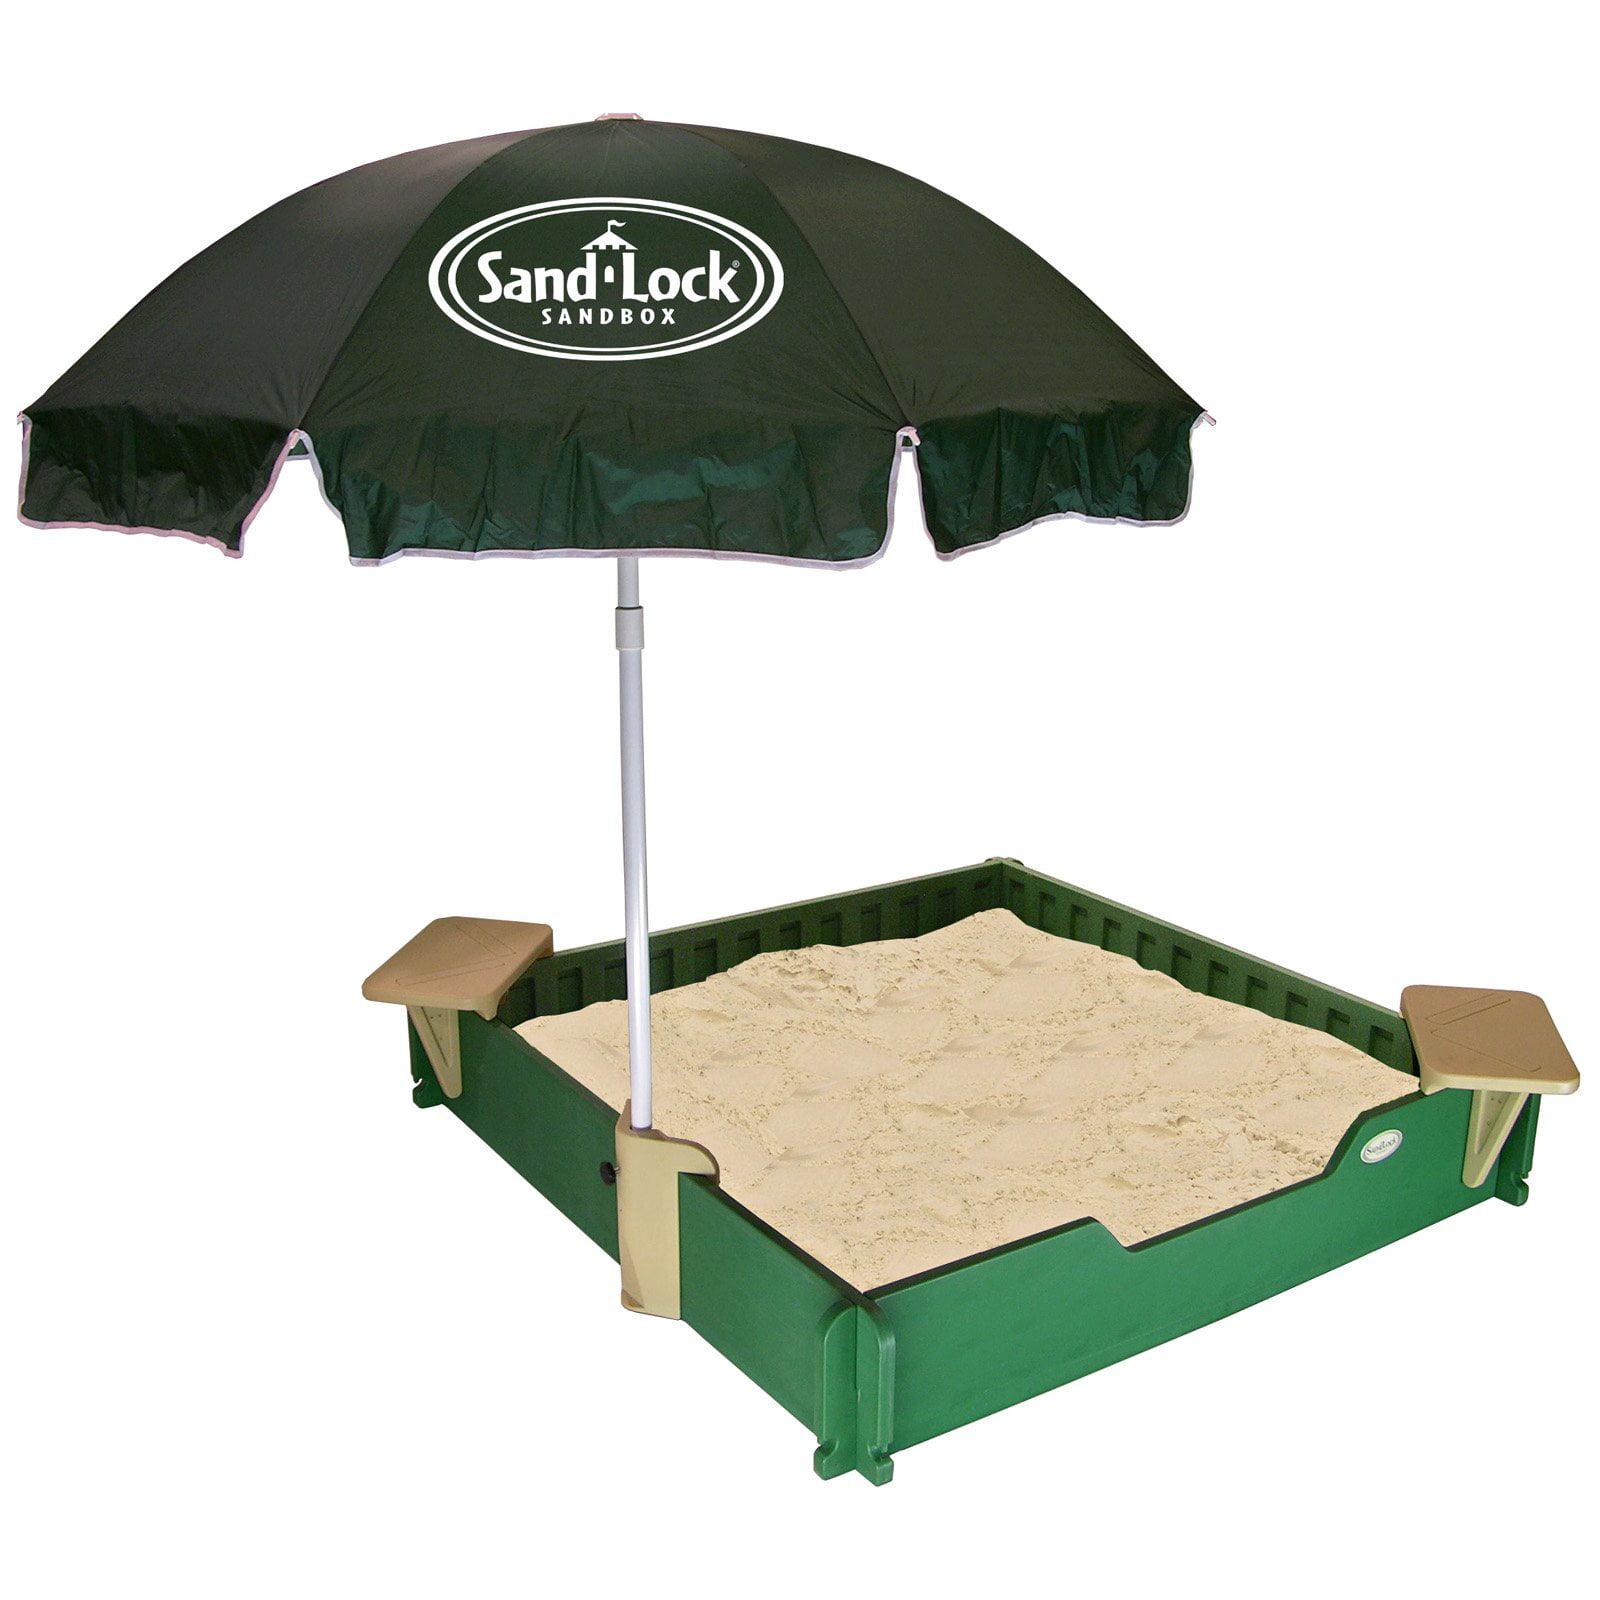 Sandlock Umbrella and Bracket Kit